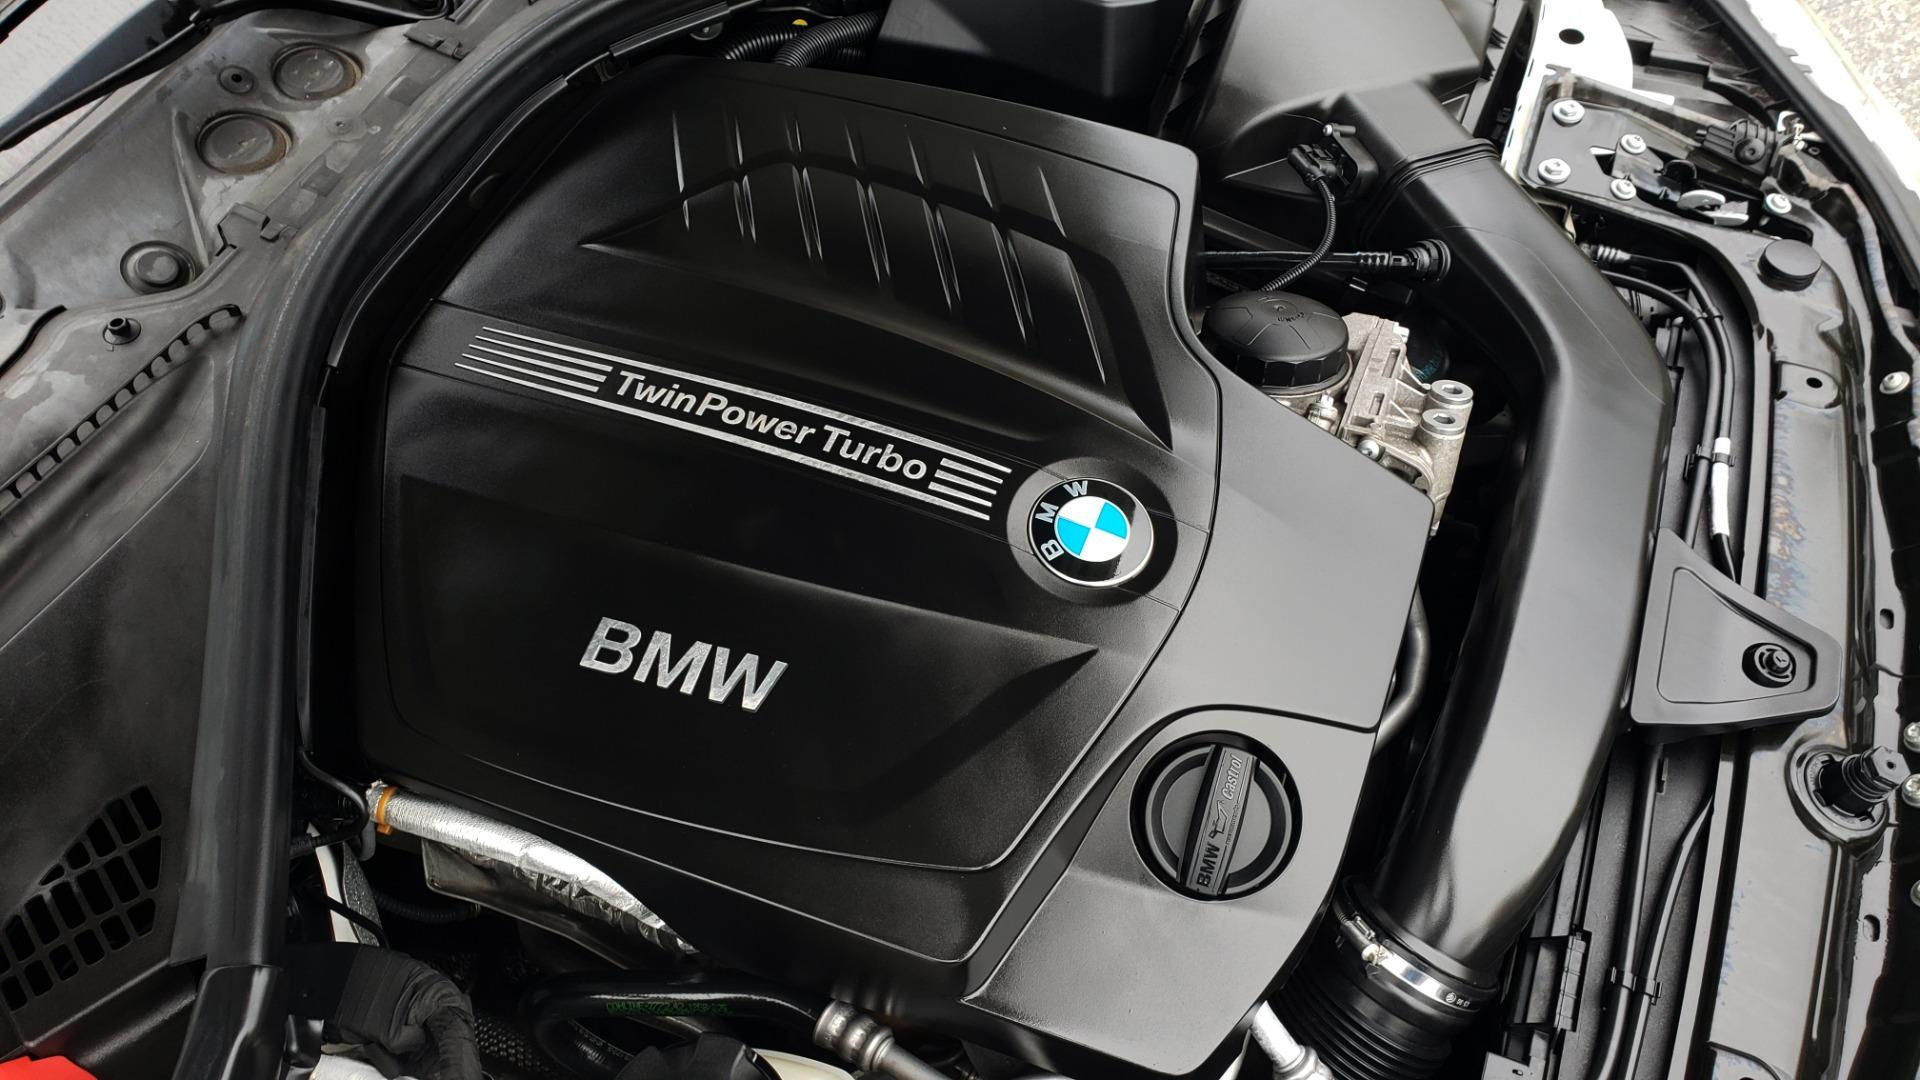 Used 2015 BMW 3 Series 335I M-SPORT / PREM PKG / HK SND / SUNROOF / REARVIEW for sale Sold at Formula Imports in Charlotte NC 28227 13